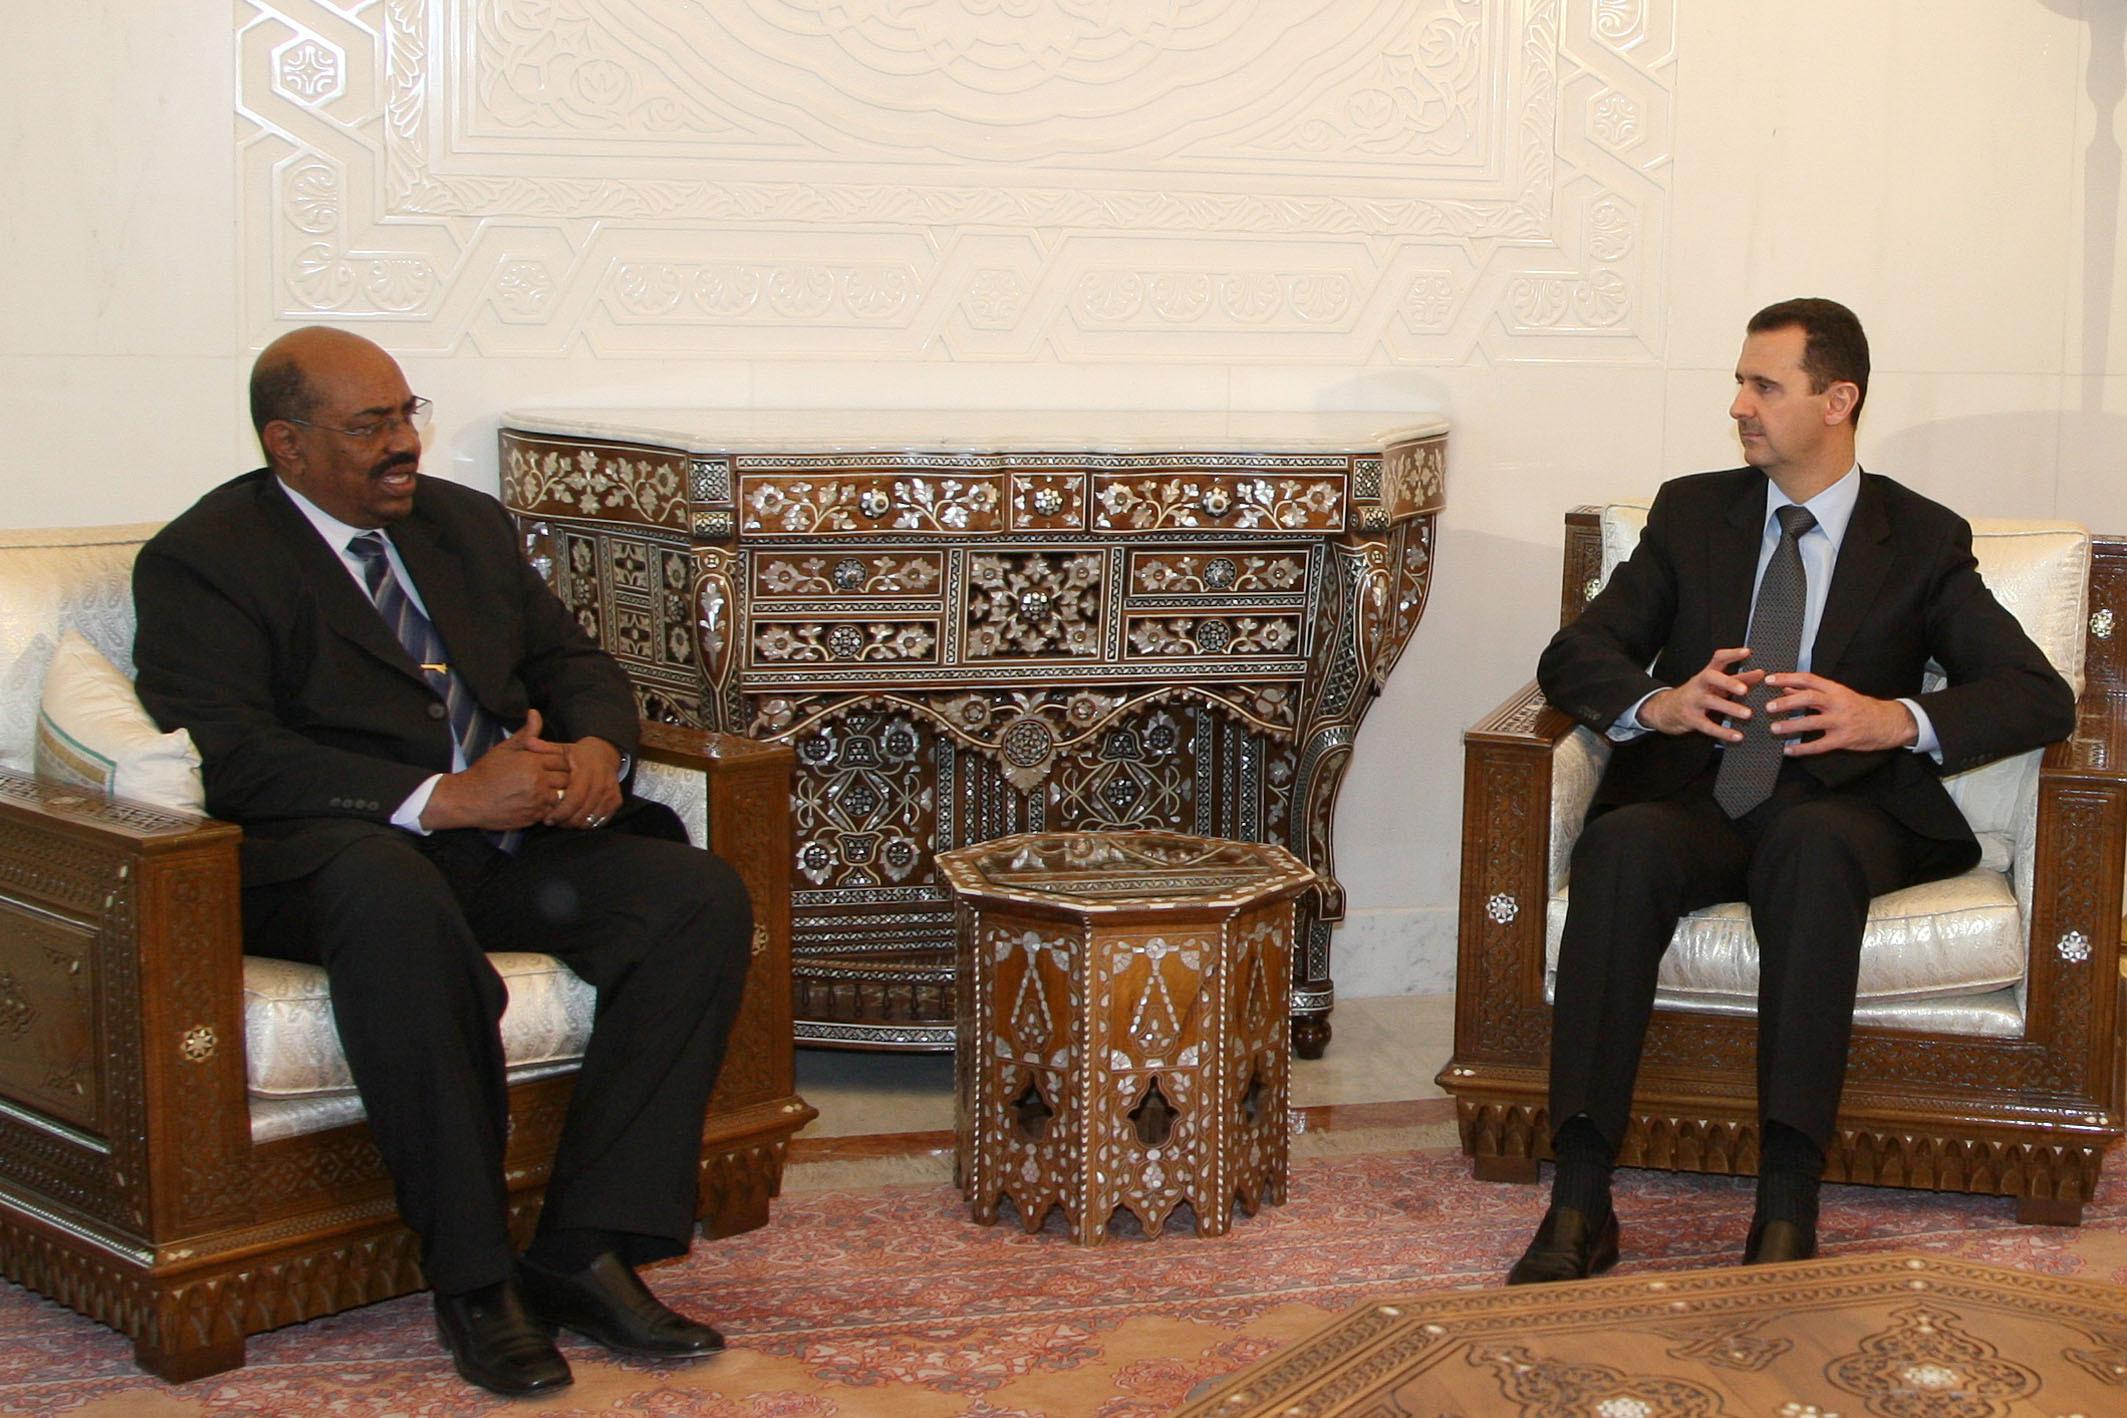 12 January 2009: Syrian President Bashar al-Assad (right) meets Sudanese President Omar al-Bashir in Damascus, Syria. (Photograph by Reuters/Khaled al-Hariri)